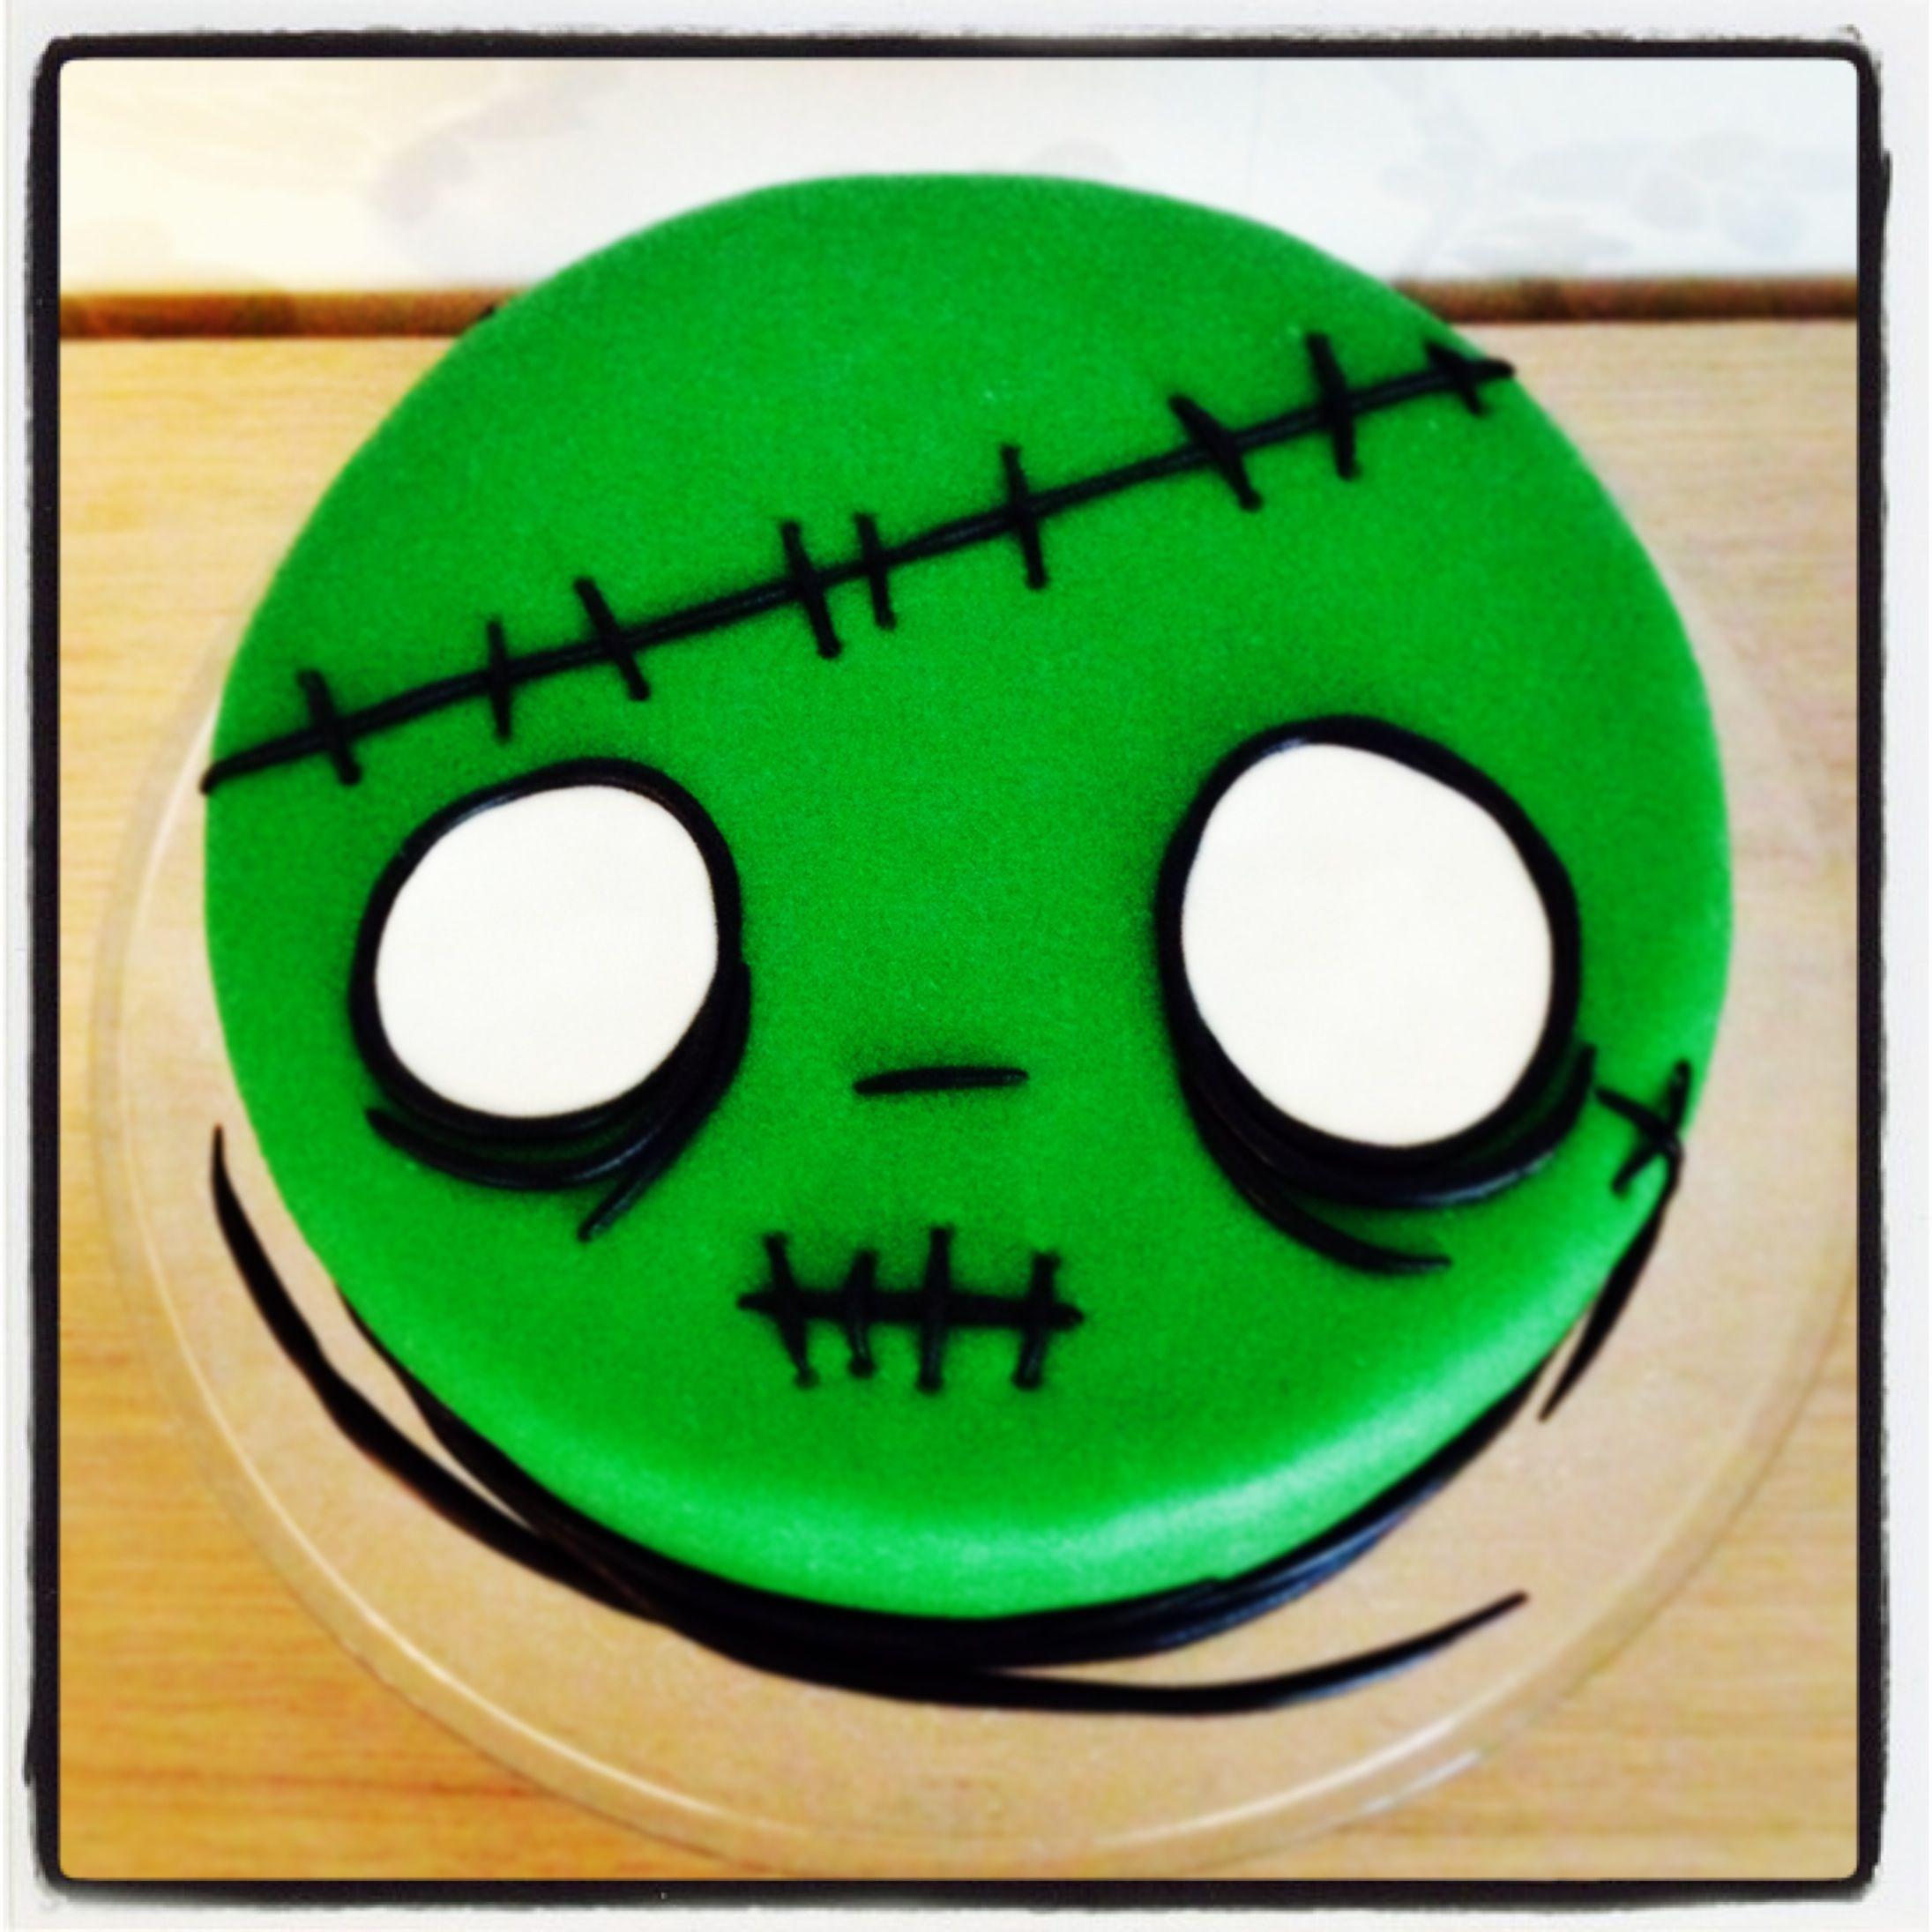 Zombie Cake With Images Zombie Cake Zombie Birthday Cakes